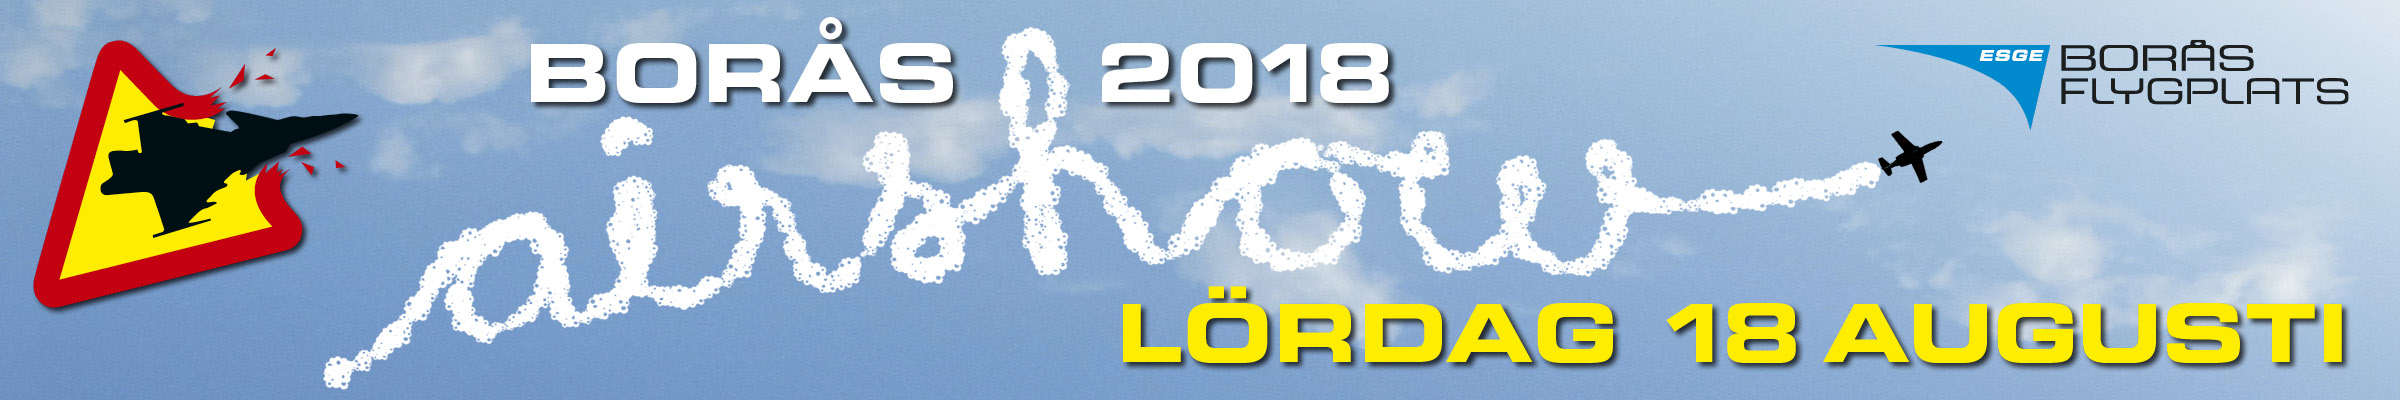 Borås Airshow 2018 header image